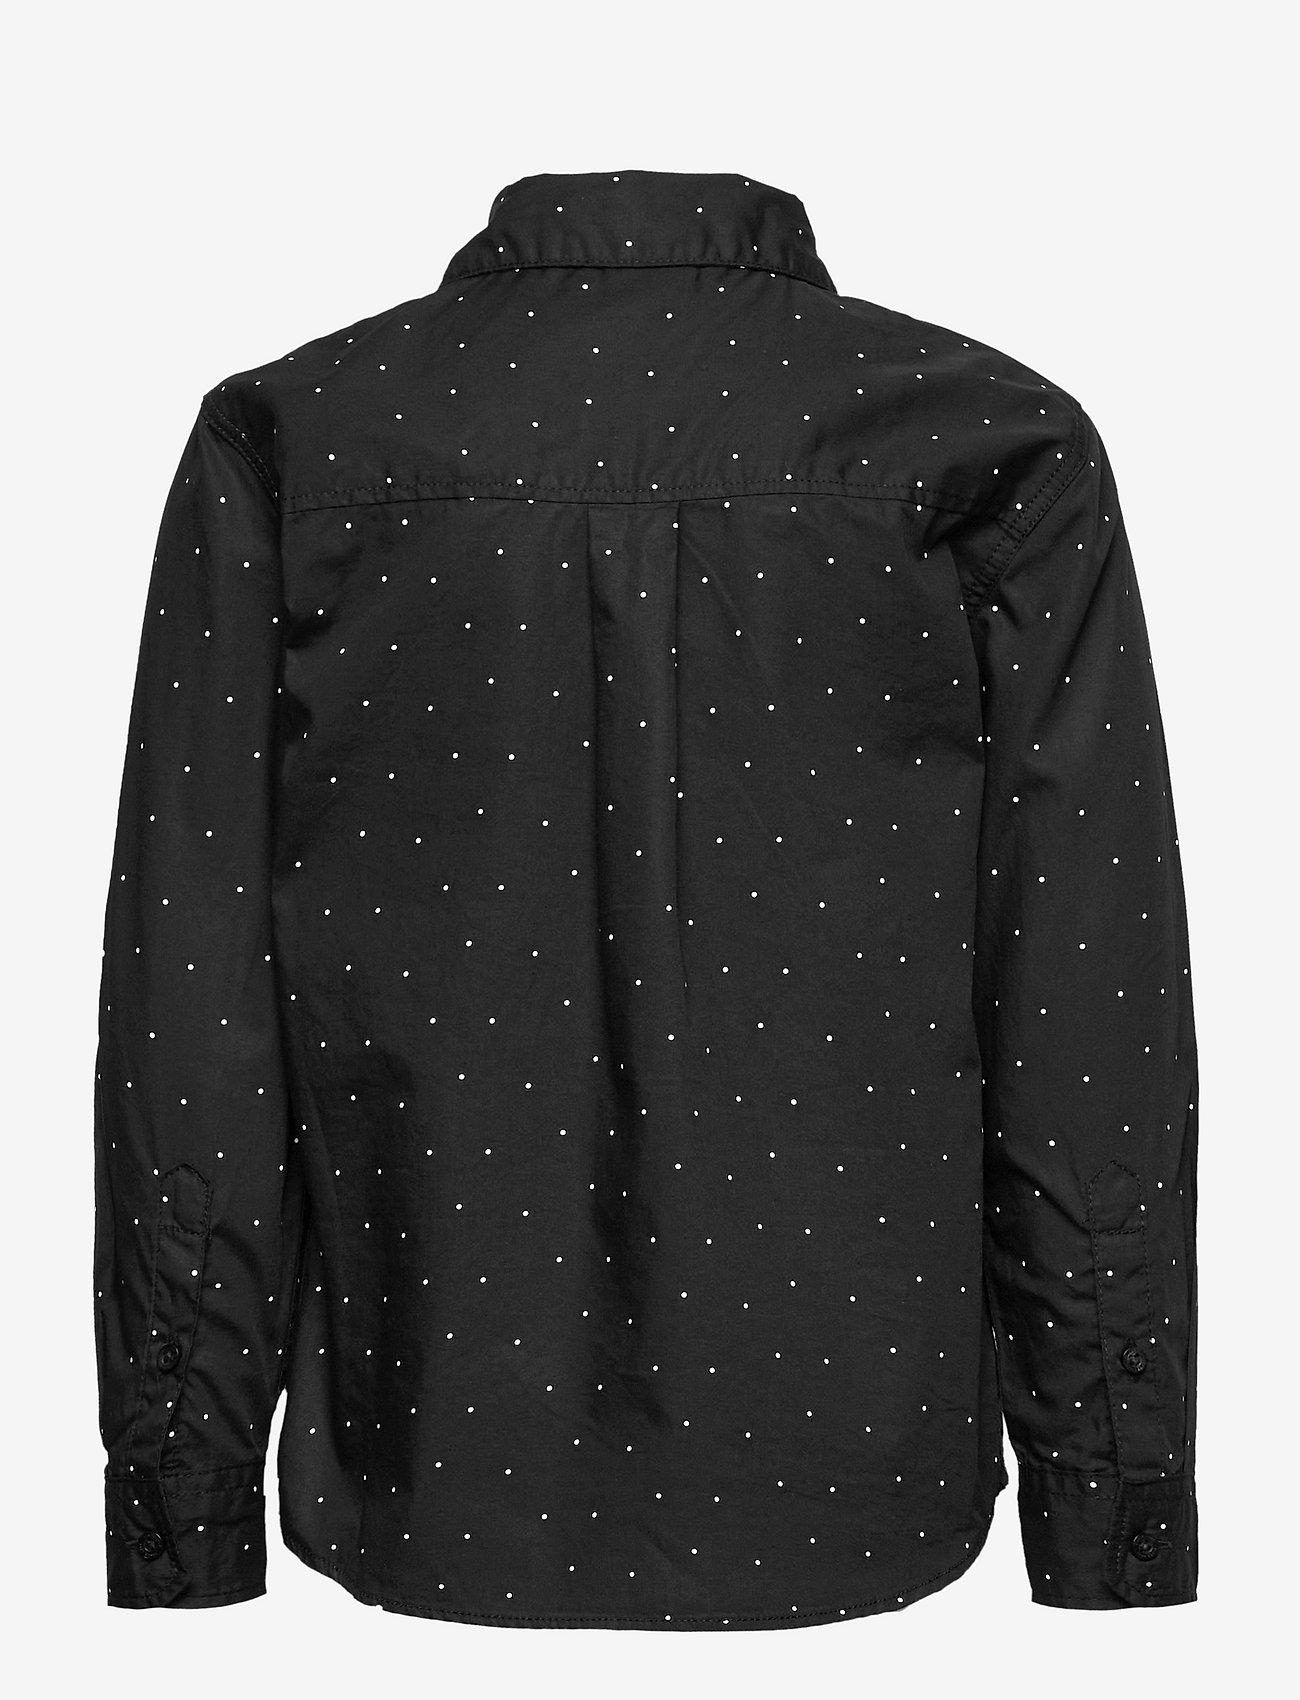 Lindex - Shirt check party aop - overhemden - black - 1